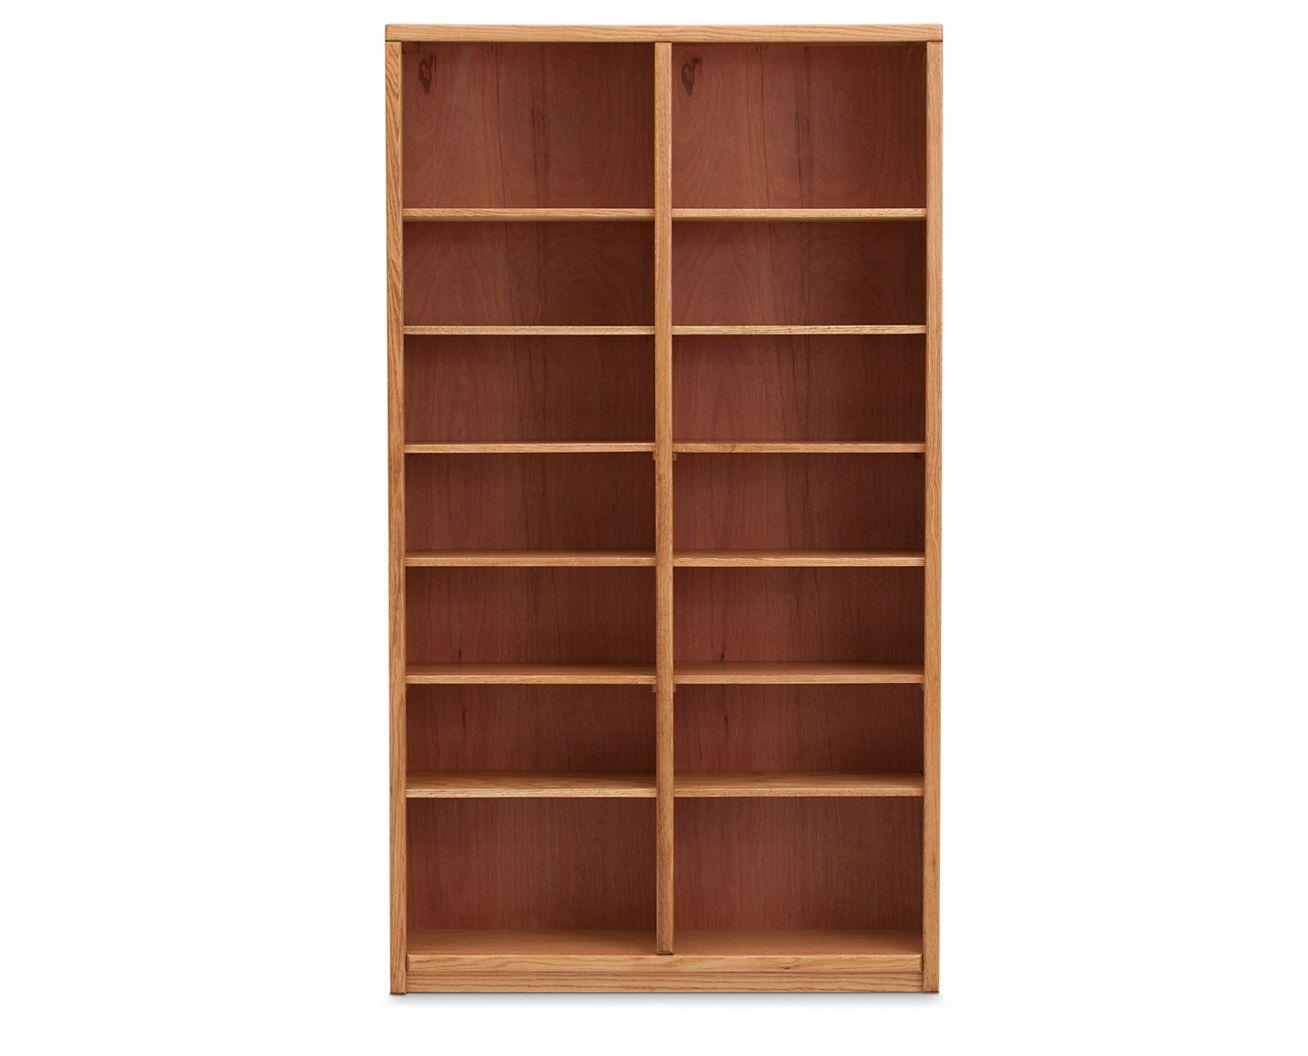 Elegant Bookshelves Office Shelf StorageFurniture Row